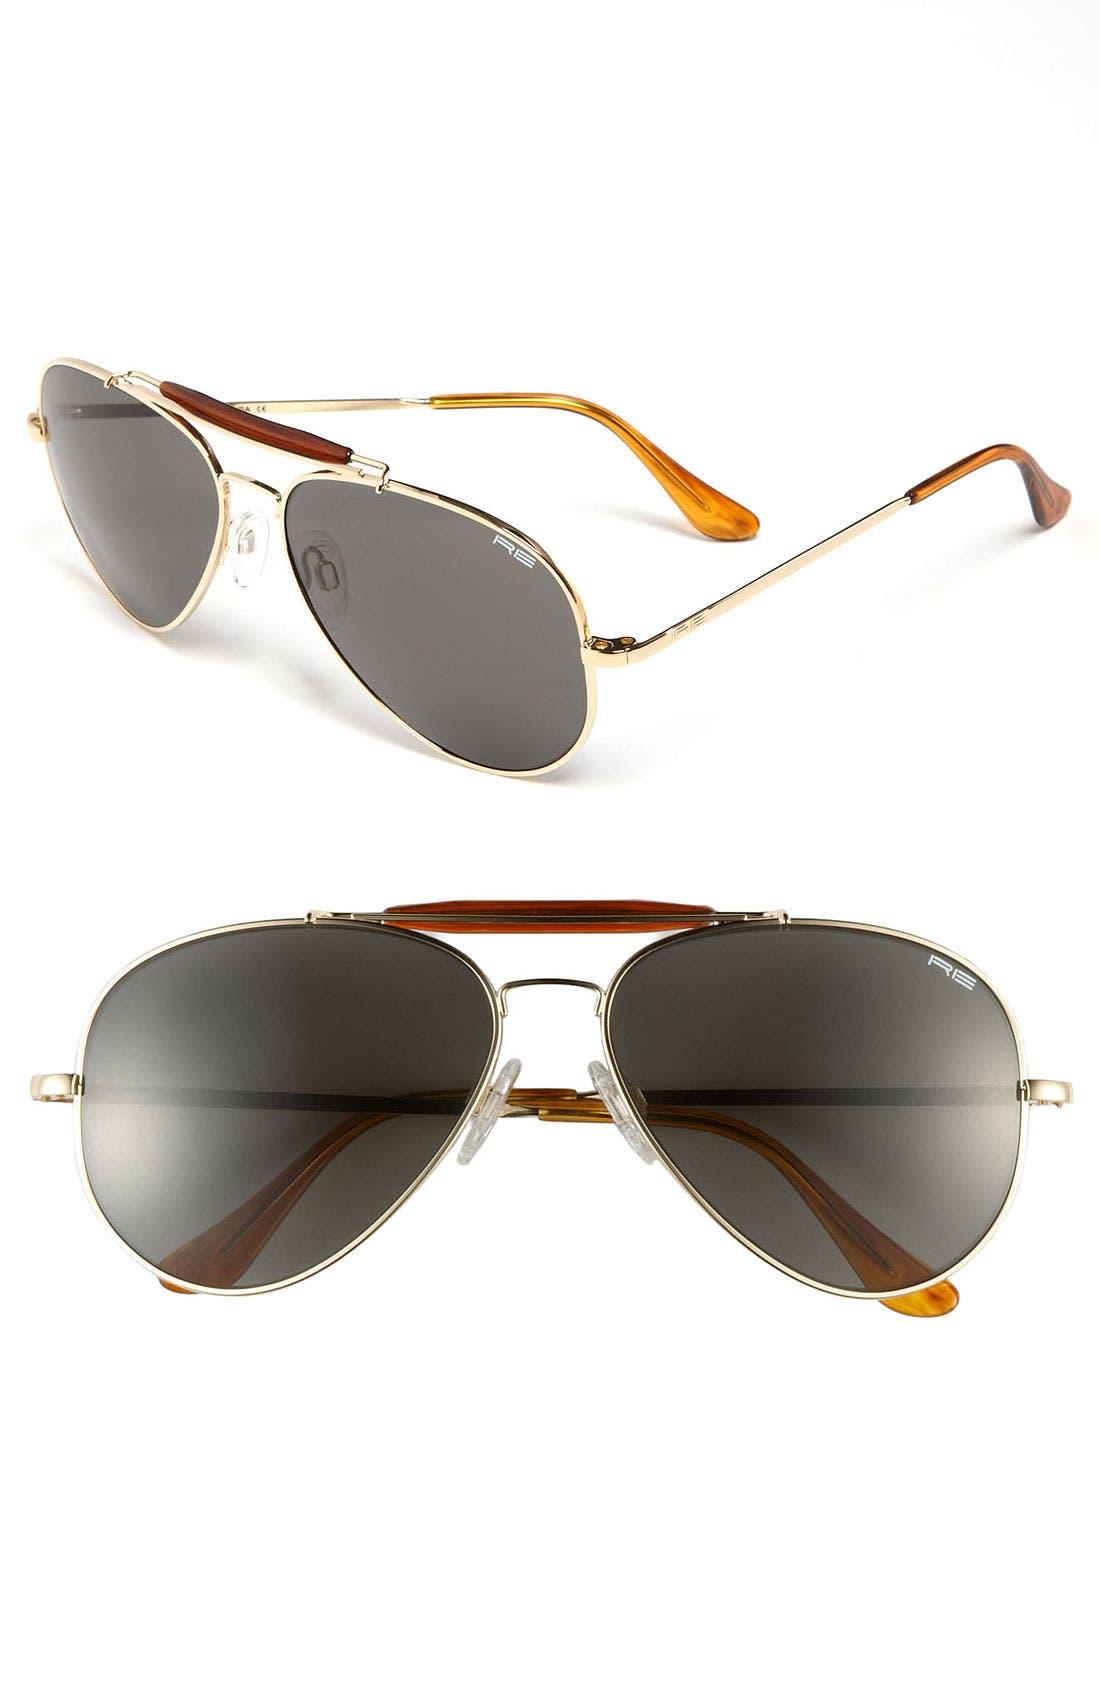 Alternate Image 1 Selected - Randolph Engineering 'Sportsman' 61mm Sunglasses